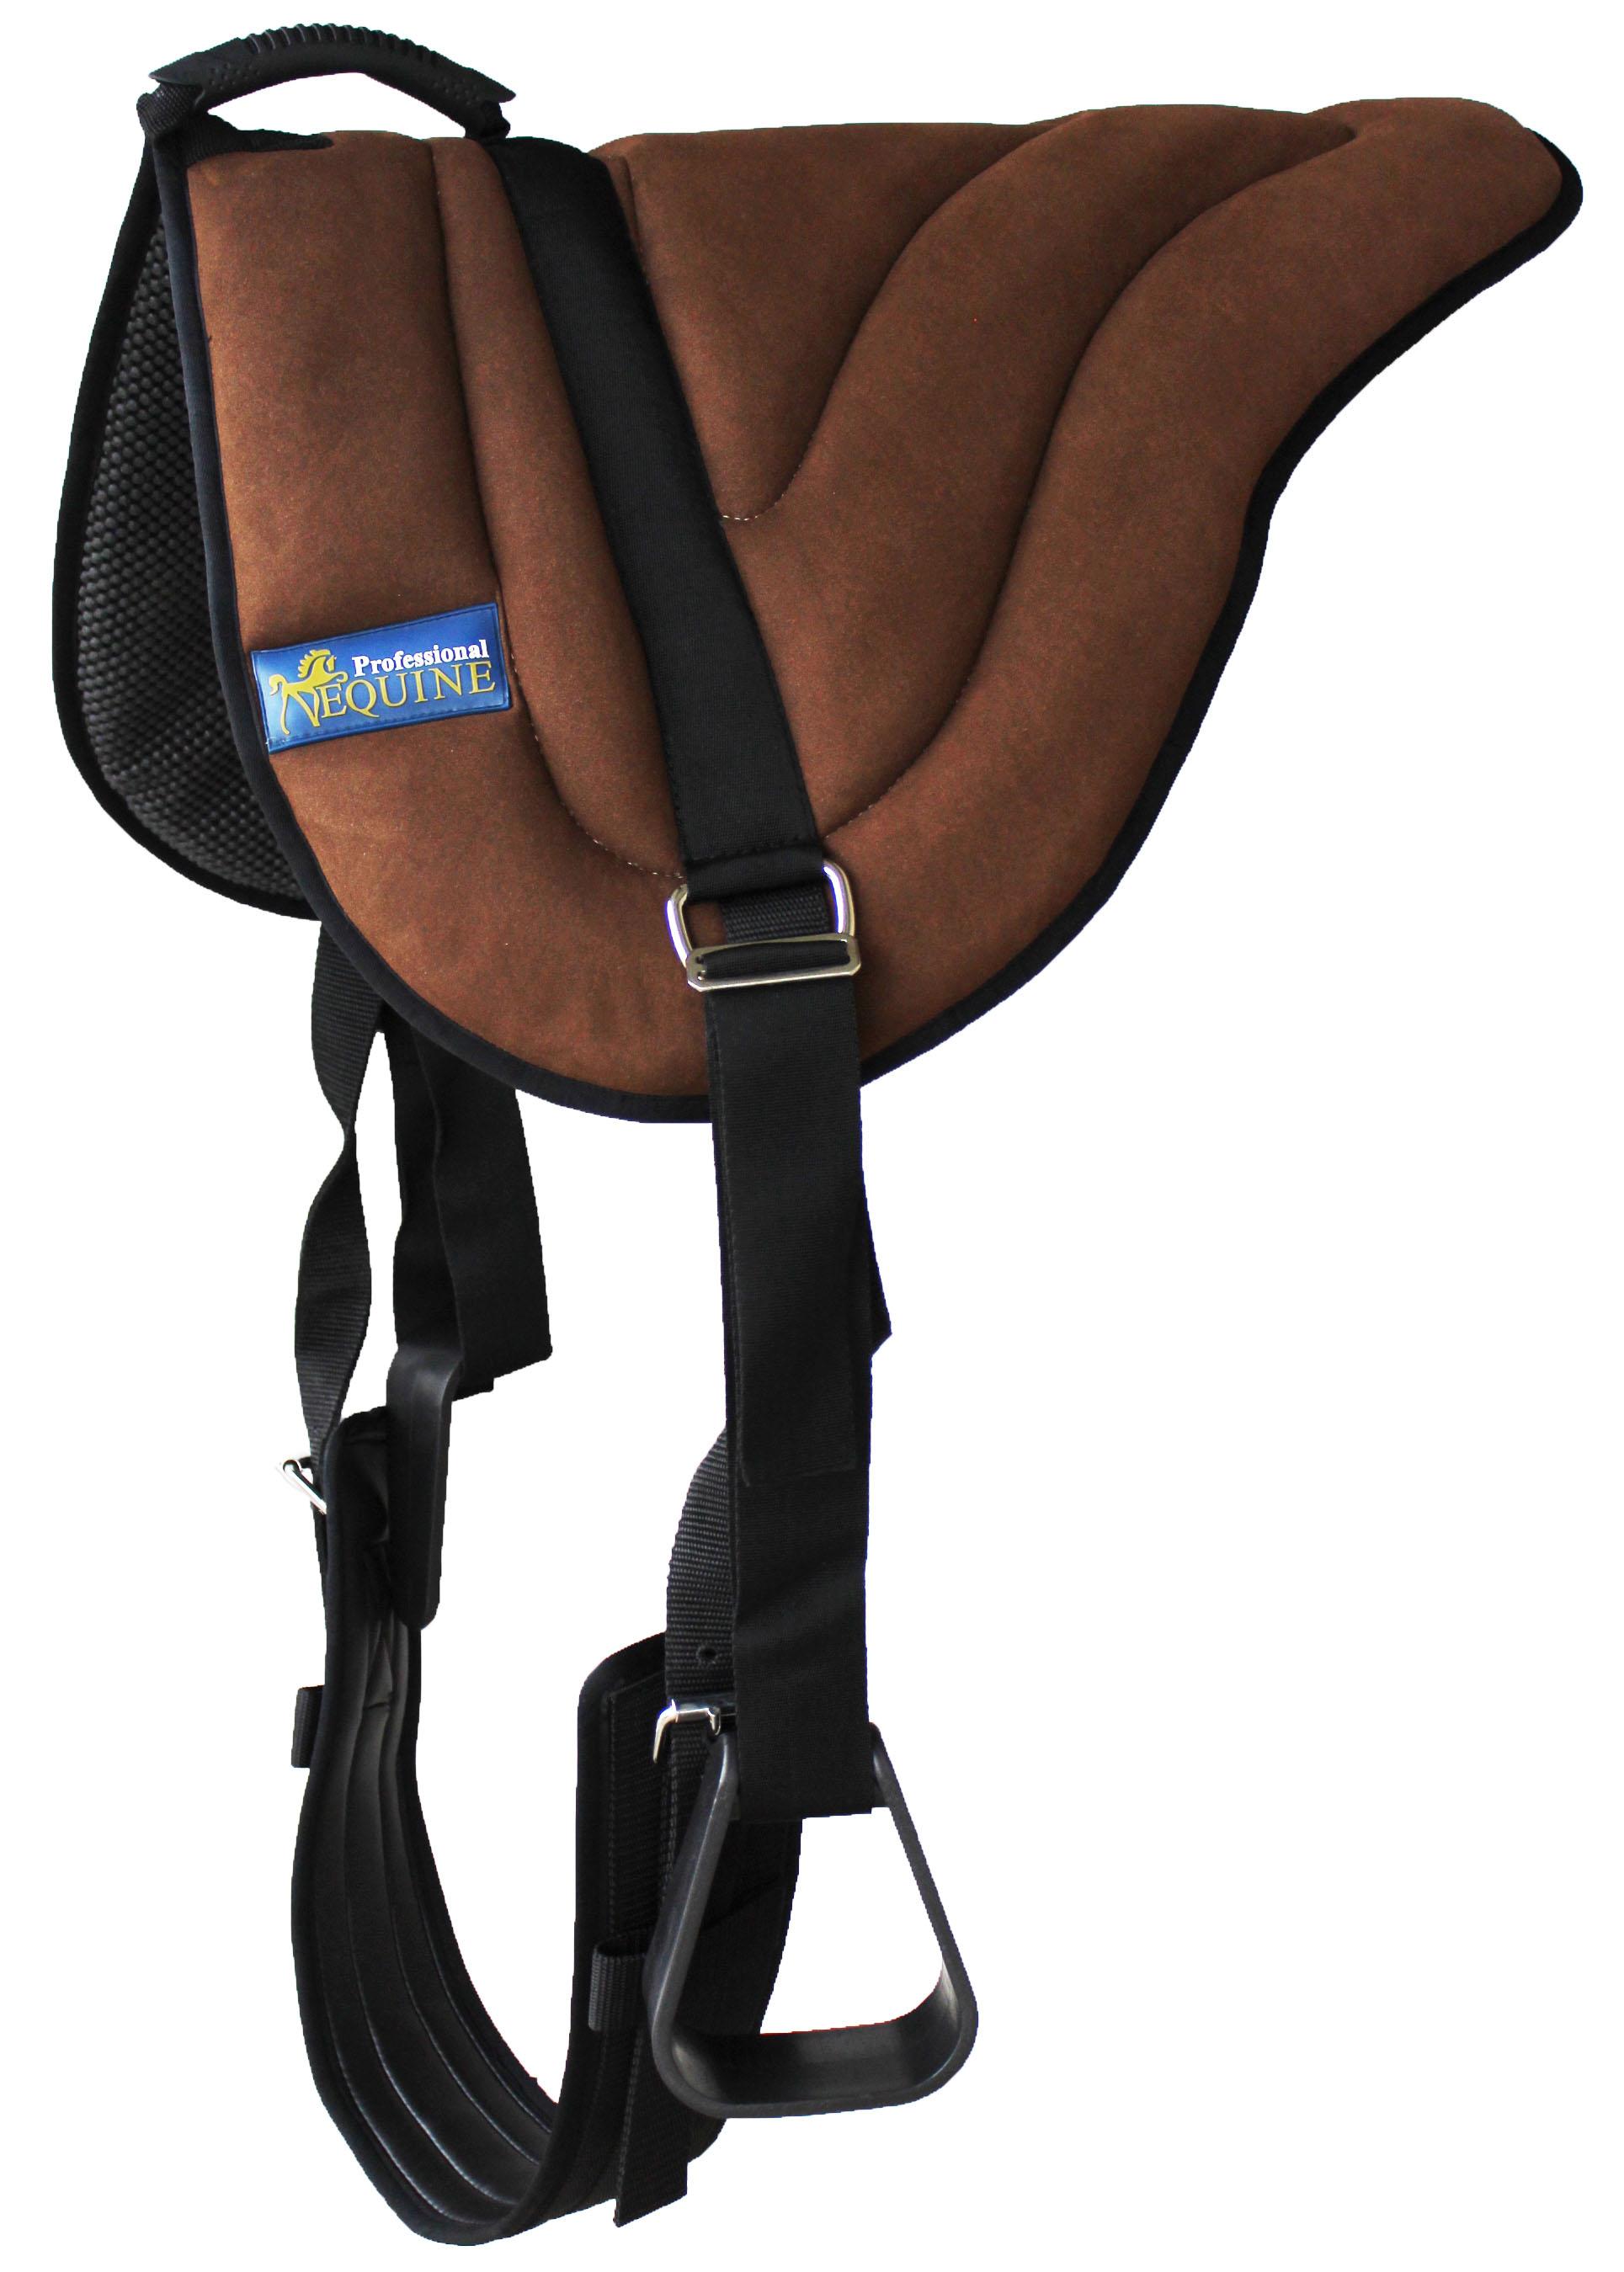 Cojín de Silla de montar caballo occidental Niños Neopreno Bareback Pad estribos 39187